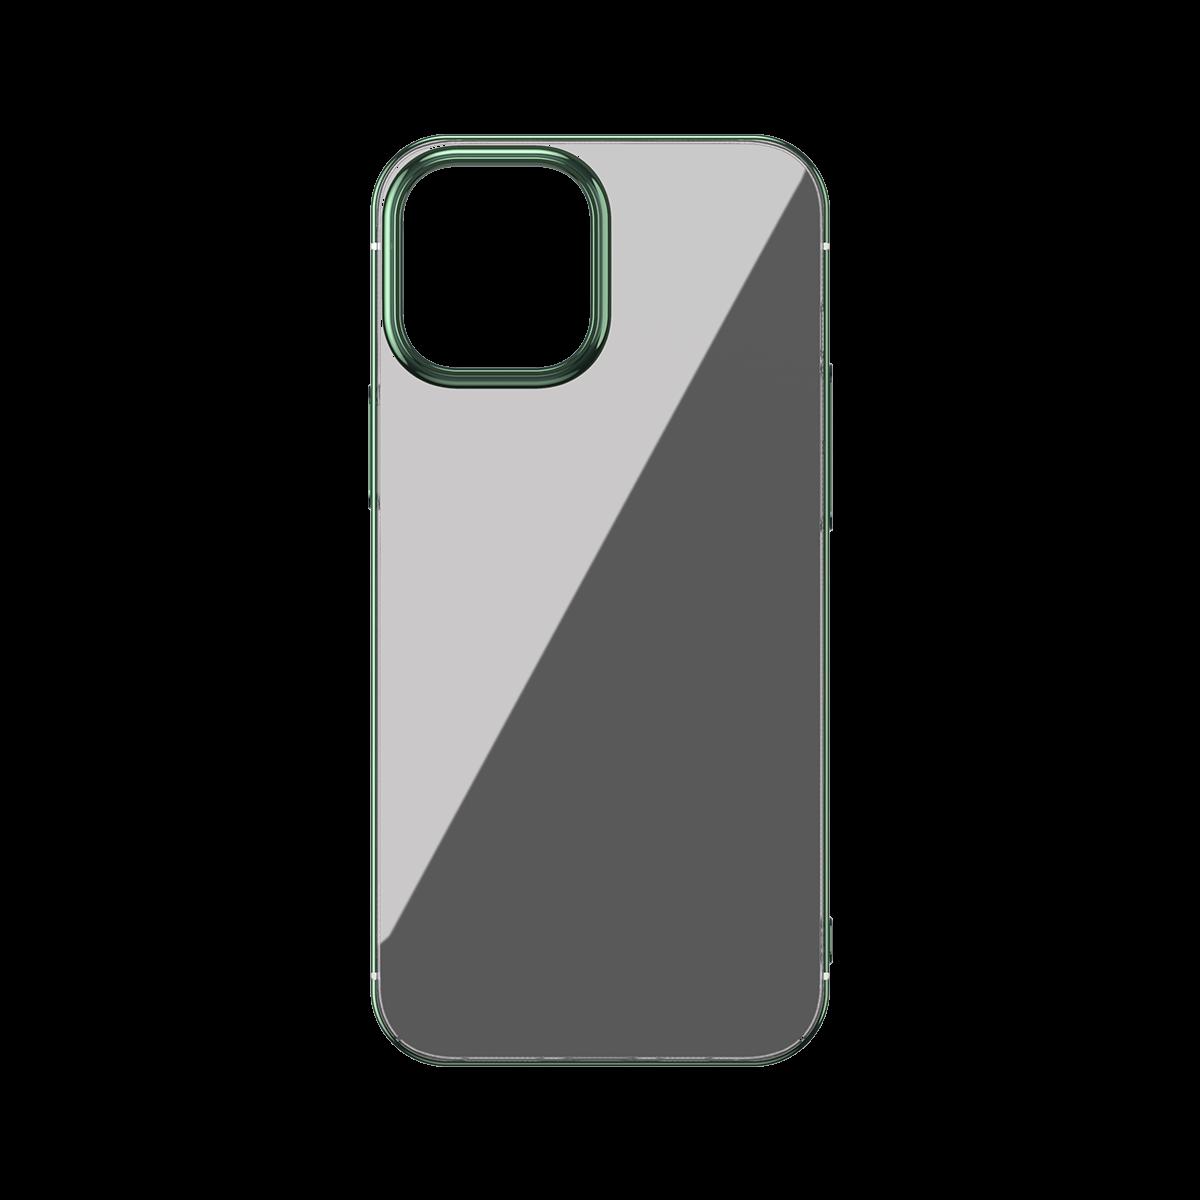 Husa Apple iPhone 12 / 12 Pro, Baseus Glitter, Verde / Transparent, 6.1 inch imagine